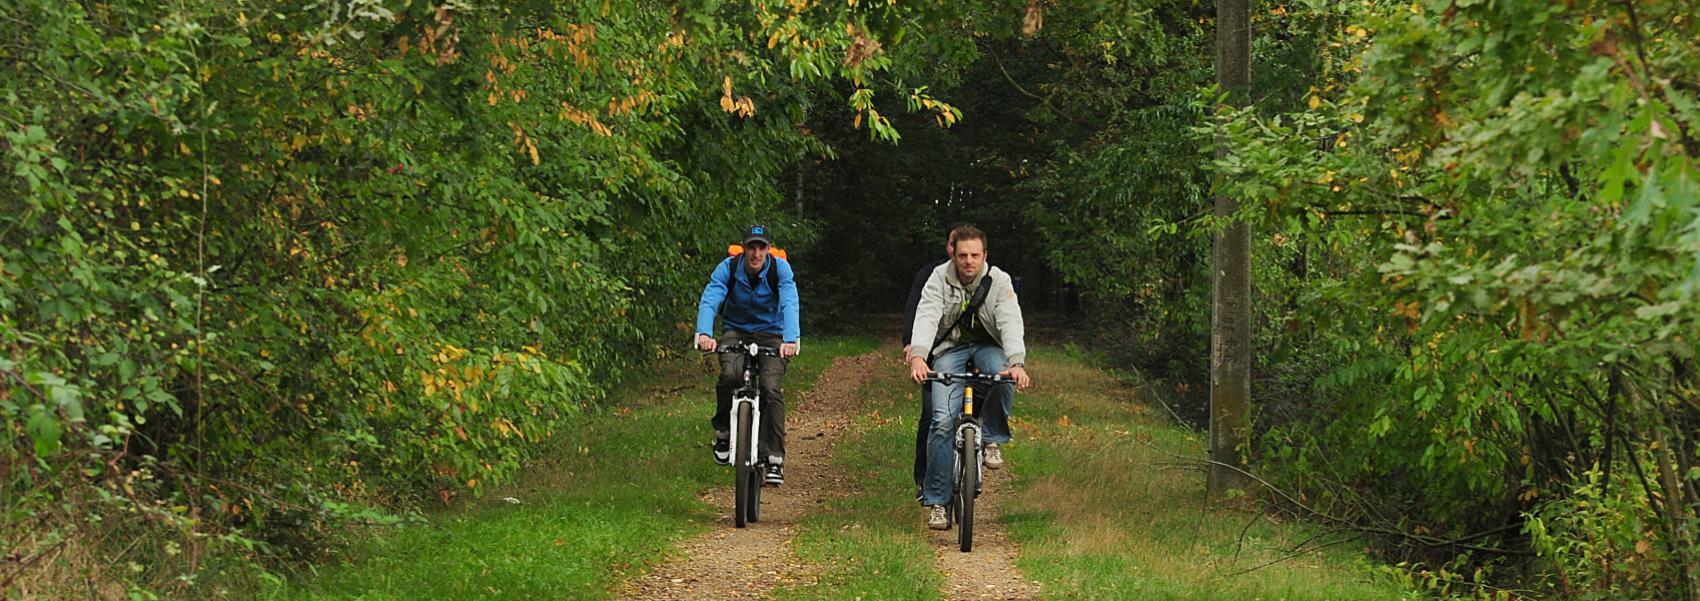 mountainbikers in het bos